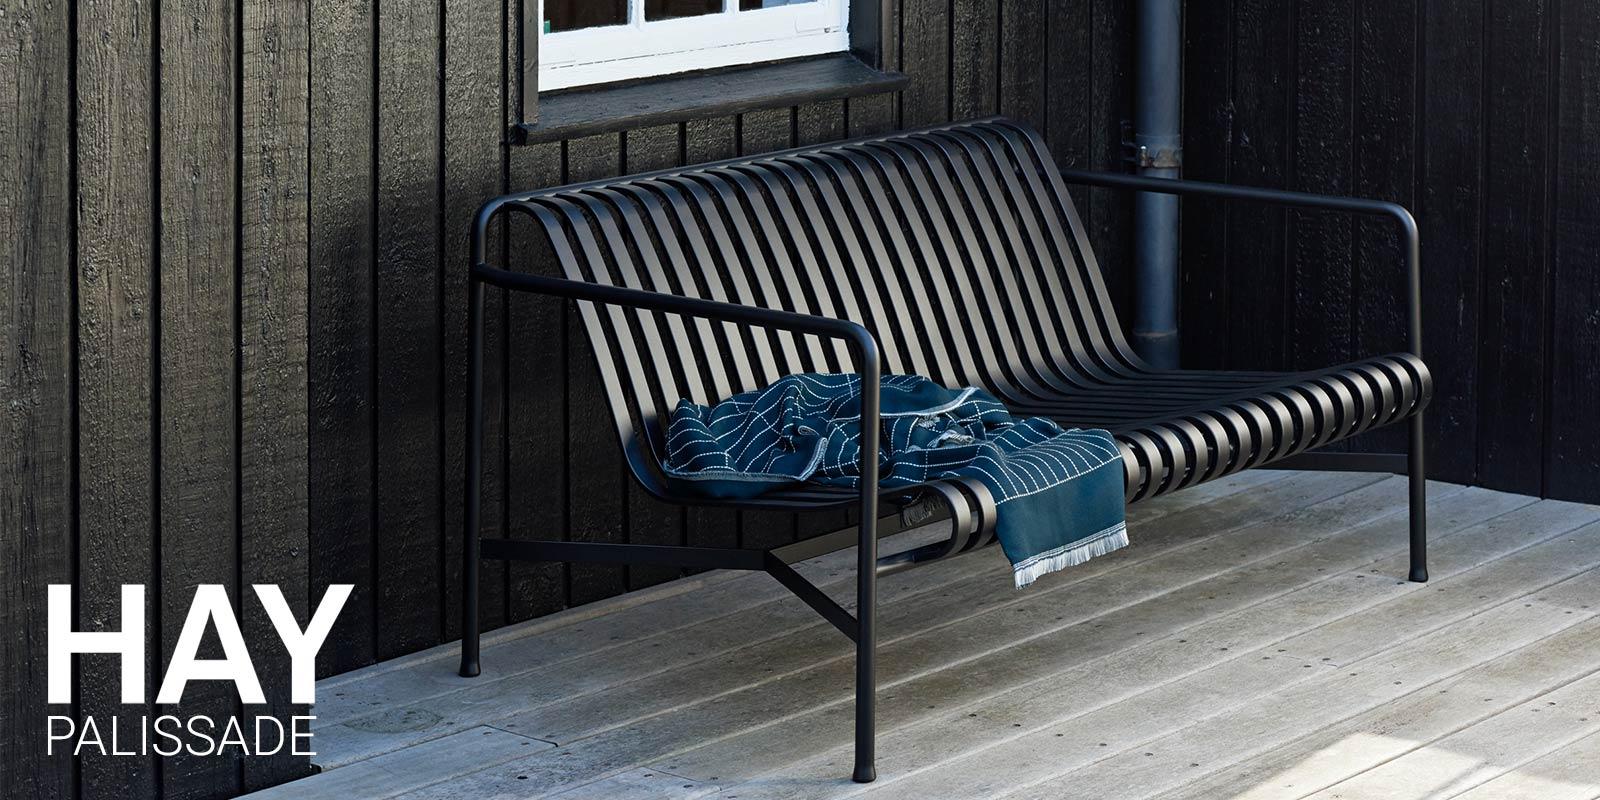 HAY Palissade Outdoor Furniture